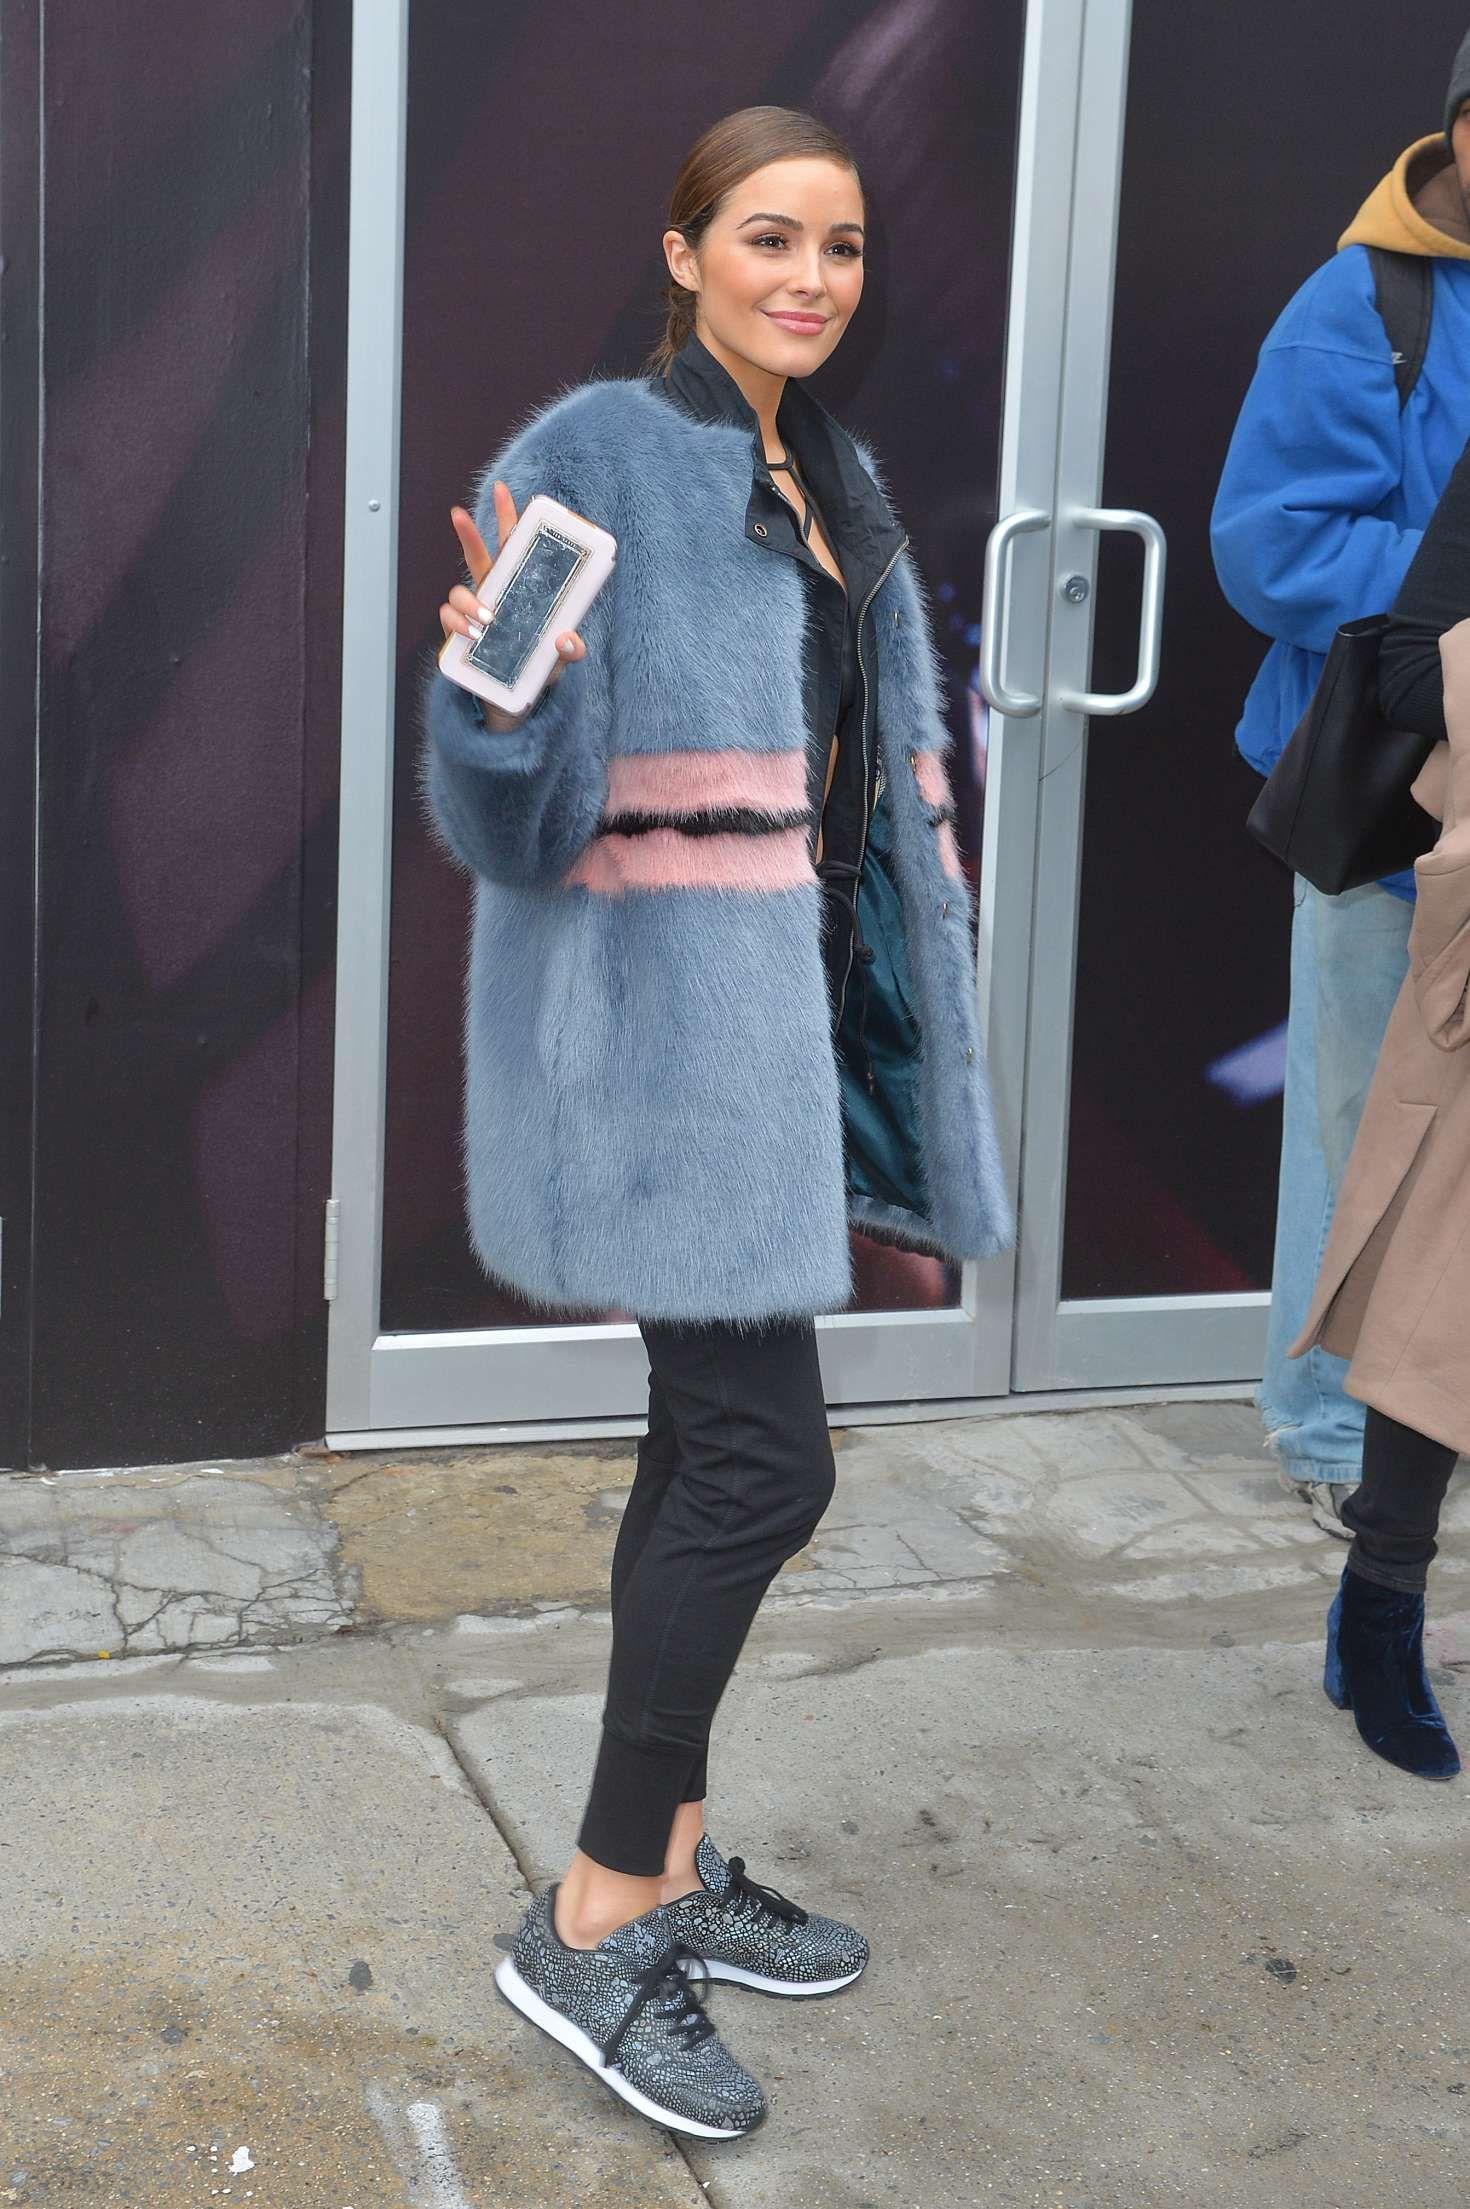 d3fbe5d1176 Olivia Culpo Leaving Reebok Panel in NYC